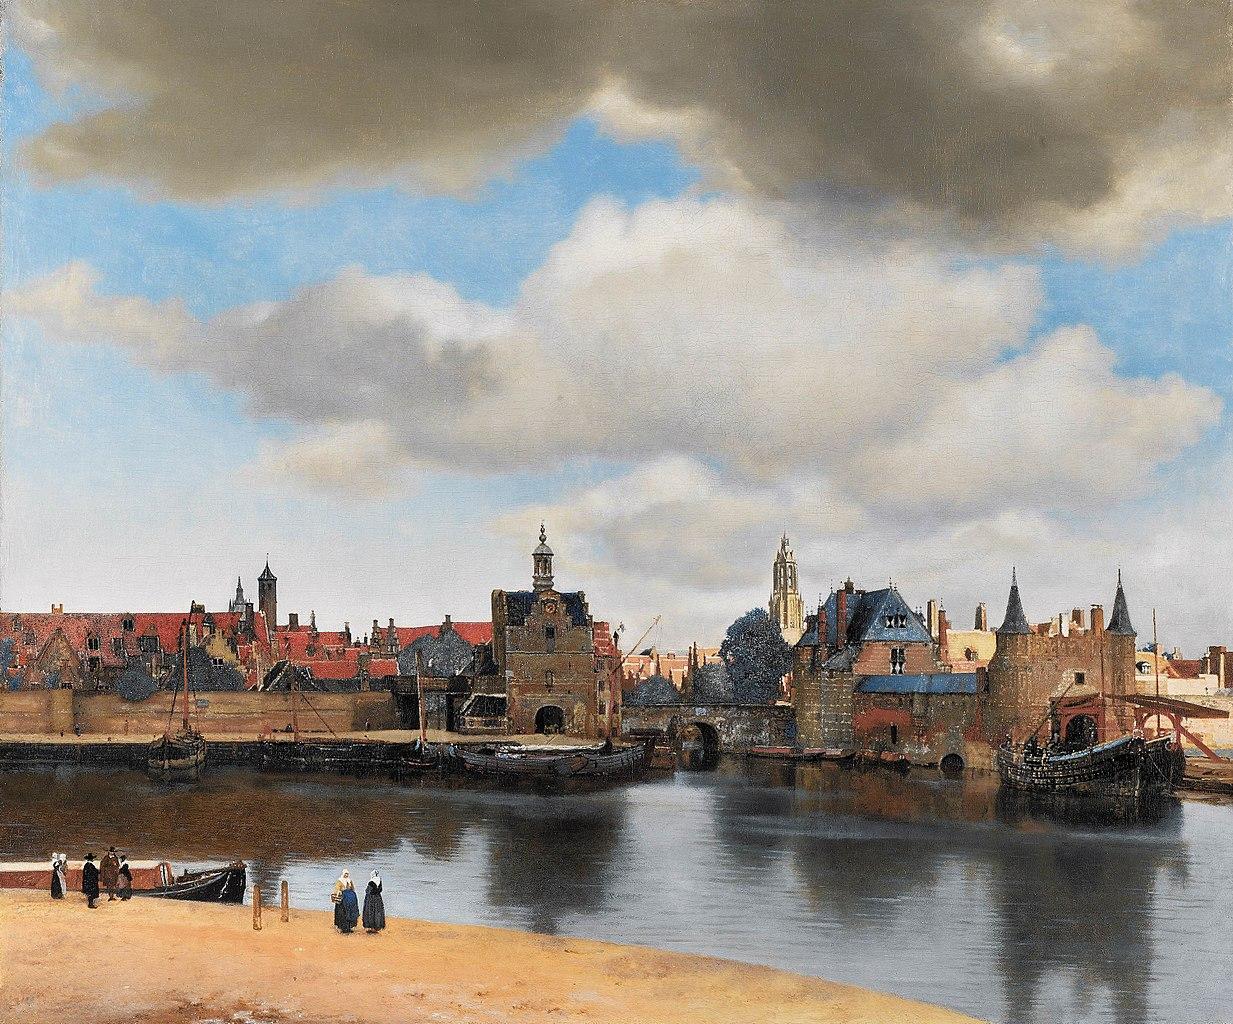 - Vista de Delft - Johannes Vermeer, cerca de 1660